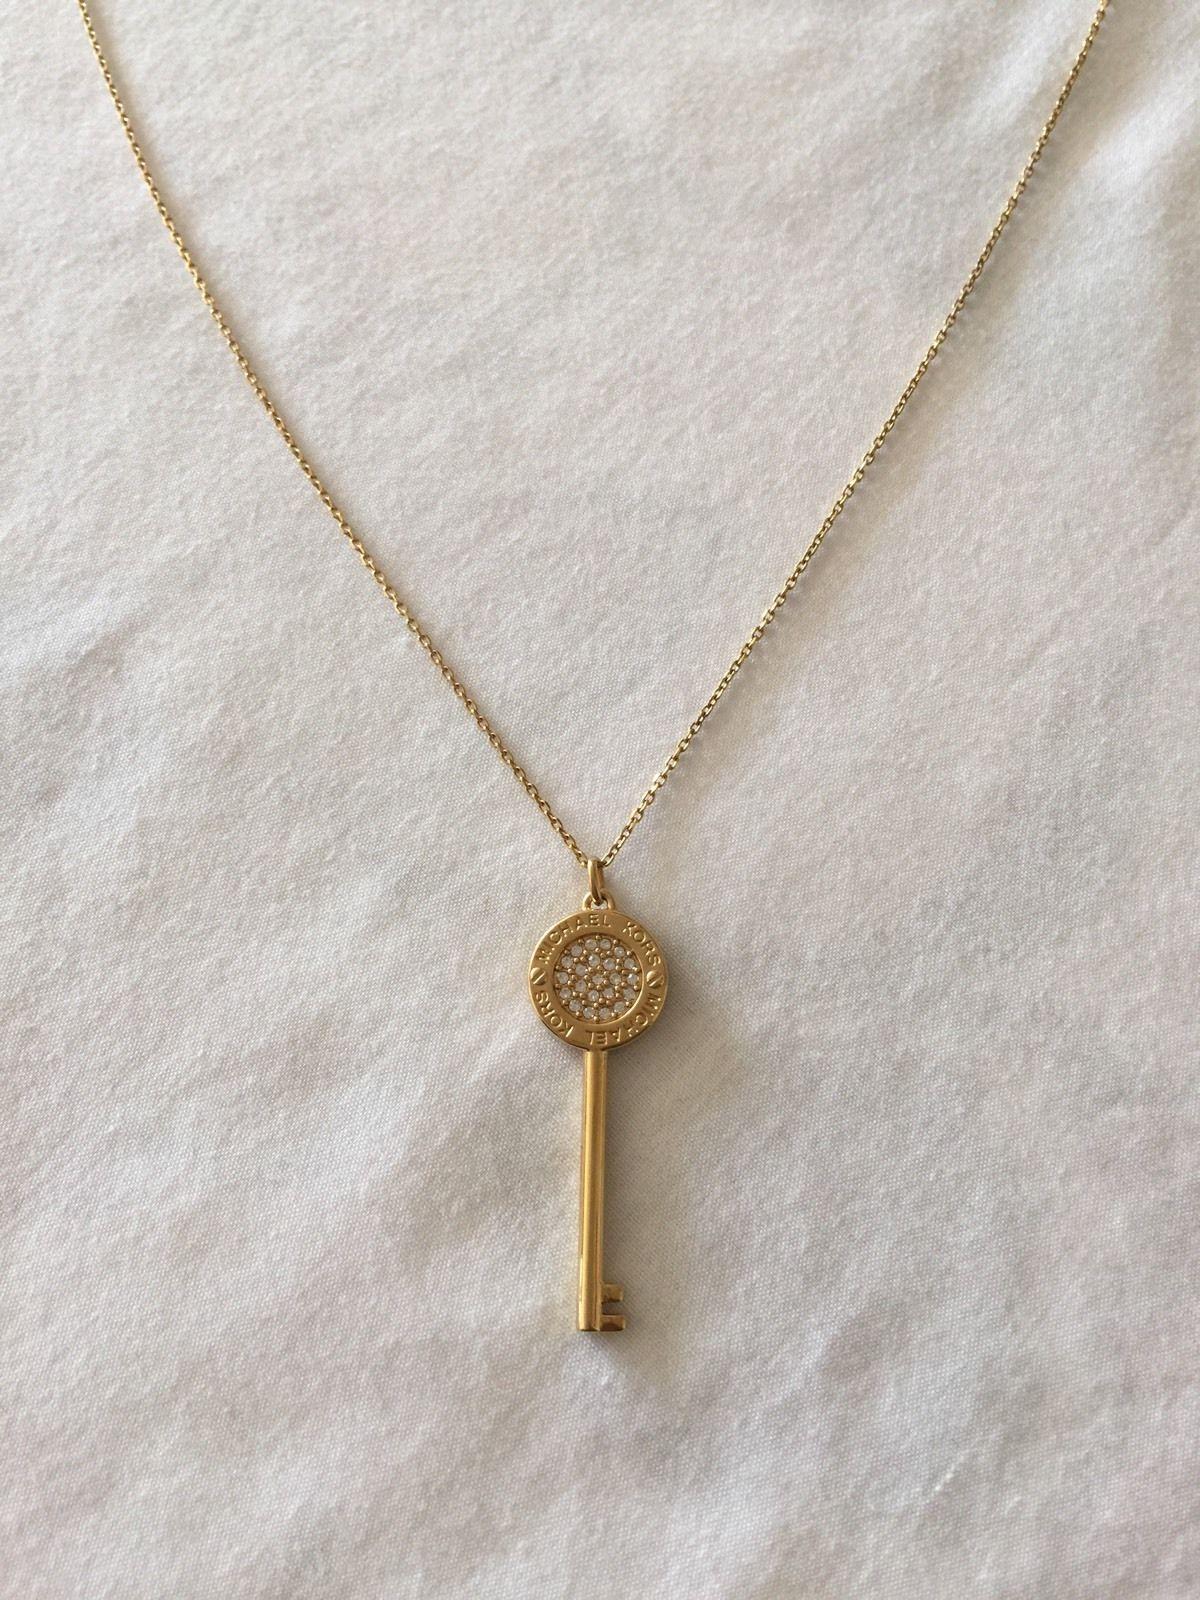 Gold Tone Key Pendant Necklace